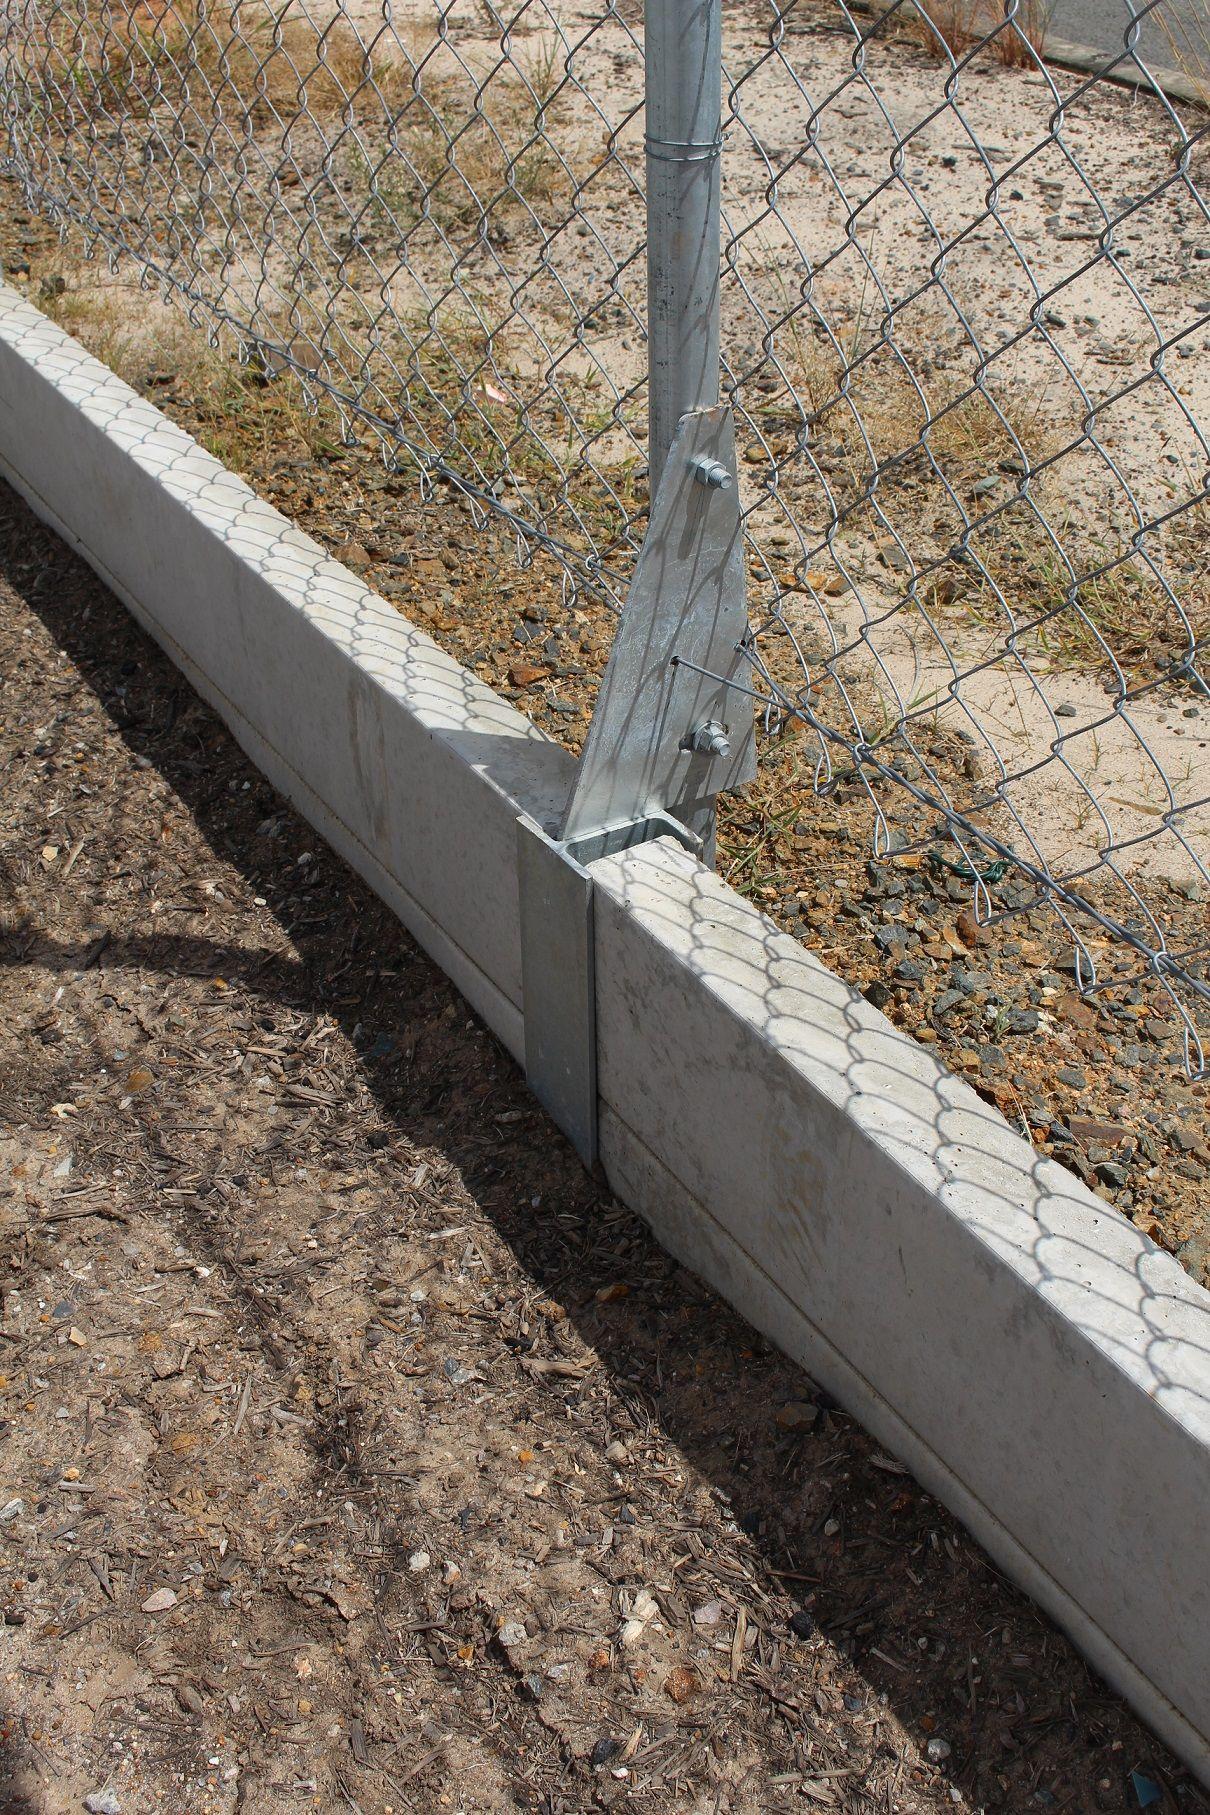 Pioneer Offset Galvanized Steel Fence Brackets Visit Www Aussieconcreteproducts Com Au Or Call 07 3348 1200 For More Information Ahir Planlari